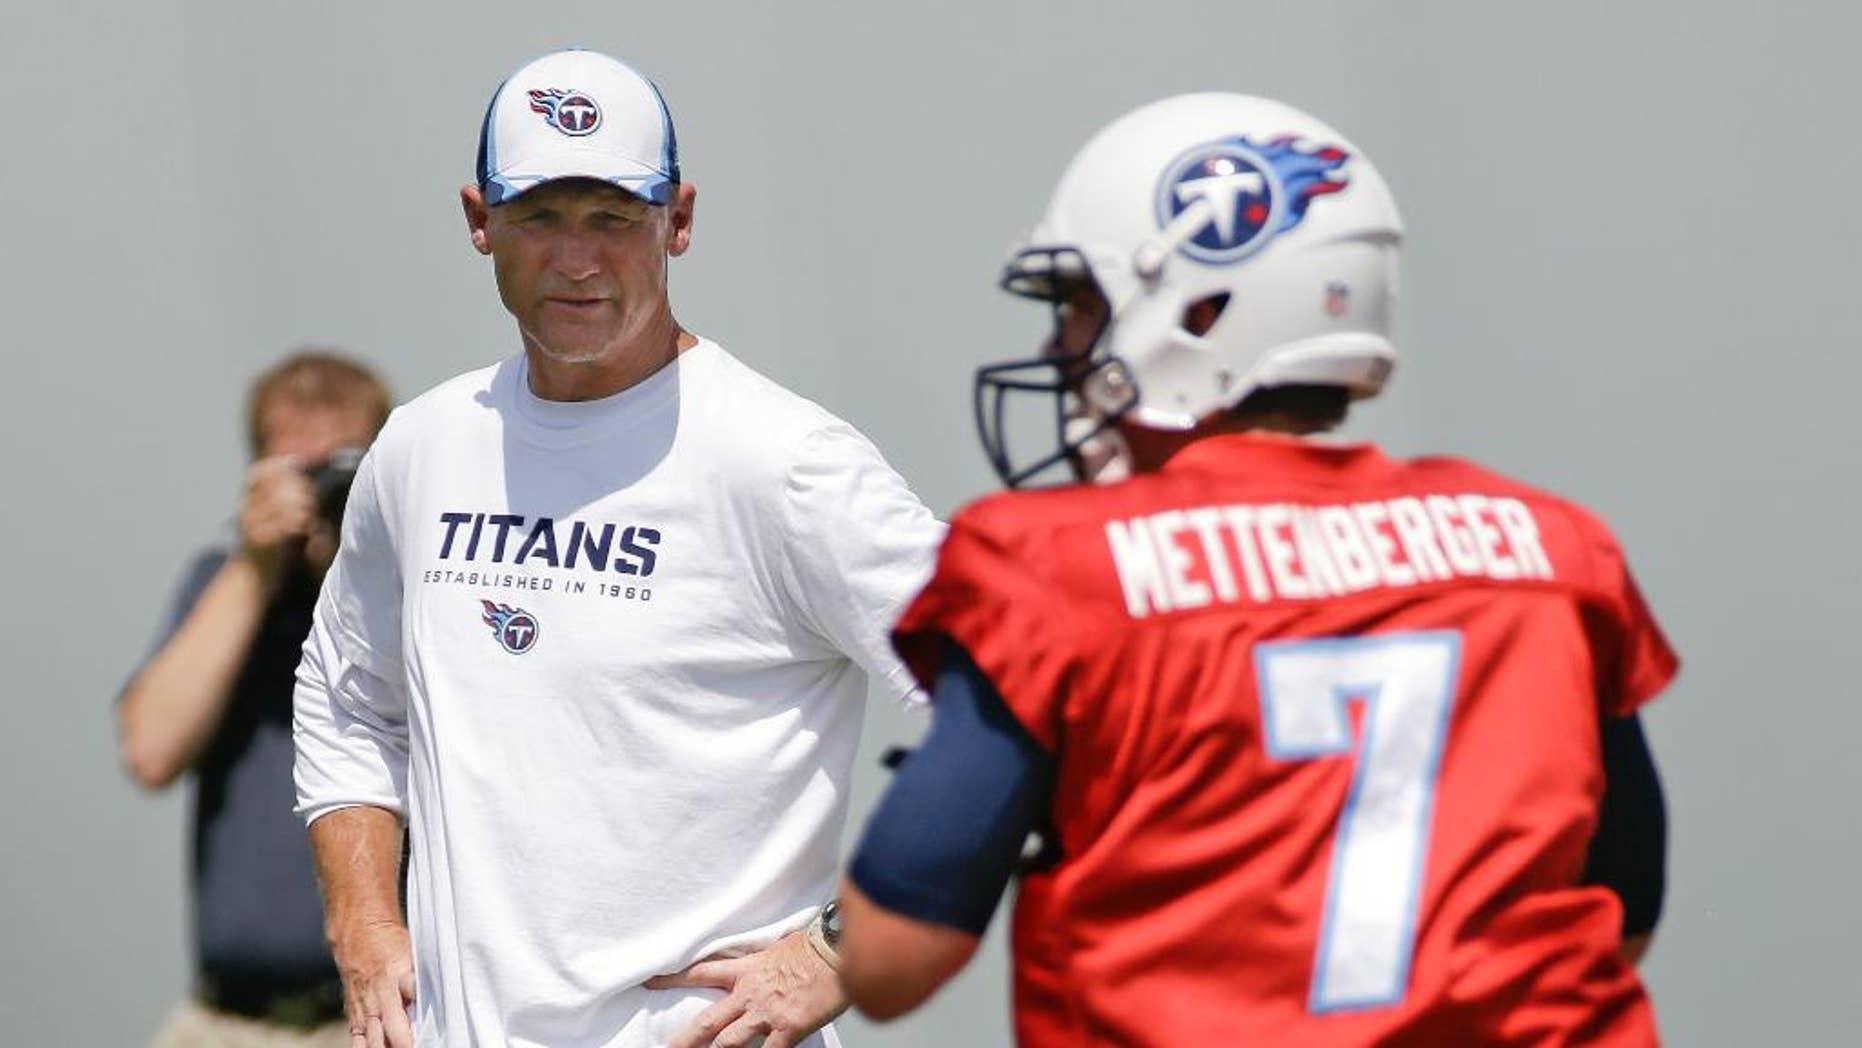 Tennessee Titans head coach Ken Whisenhunt watches as quarterback Zach Mettenberger (7) throws during NFL football minicamp on Tuesday, June 17, 2014, in Nashville, Tenn. (AP Photo/Mark Humphrey)